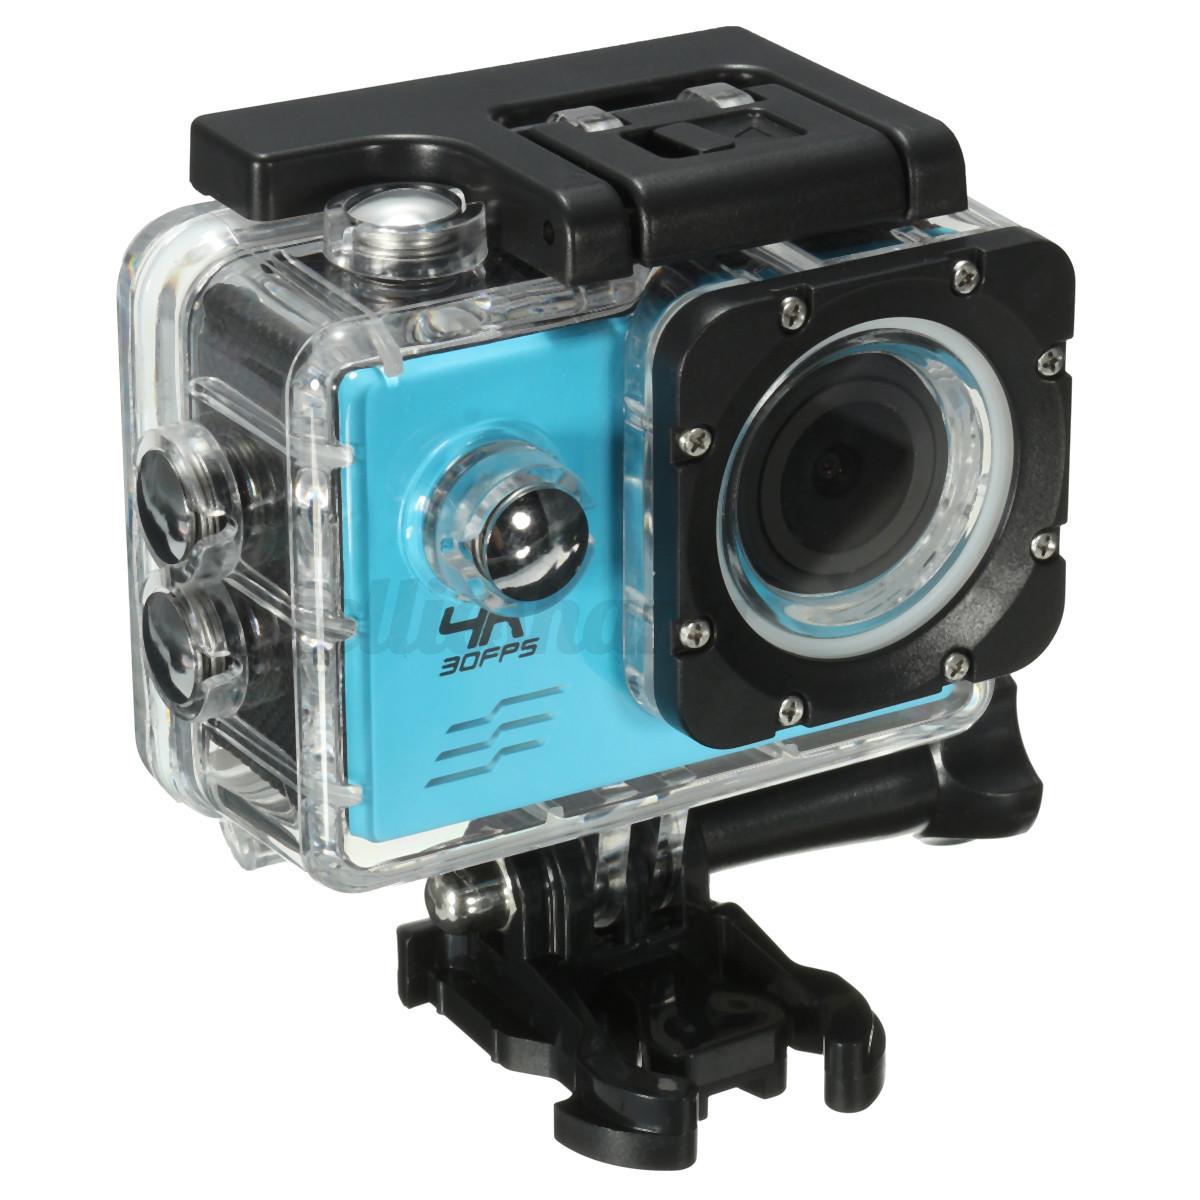 SJ9000-4K-Ultra-HD-Wifi-Camara-Video-Deportiva-Accion-Sumergible-Impermeable-DV